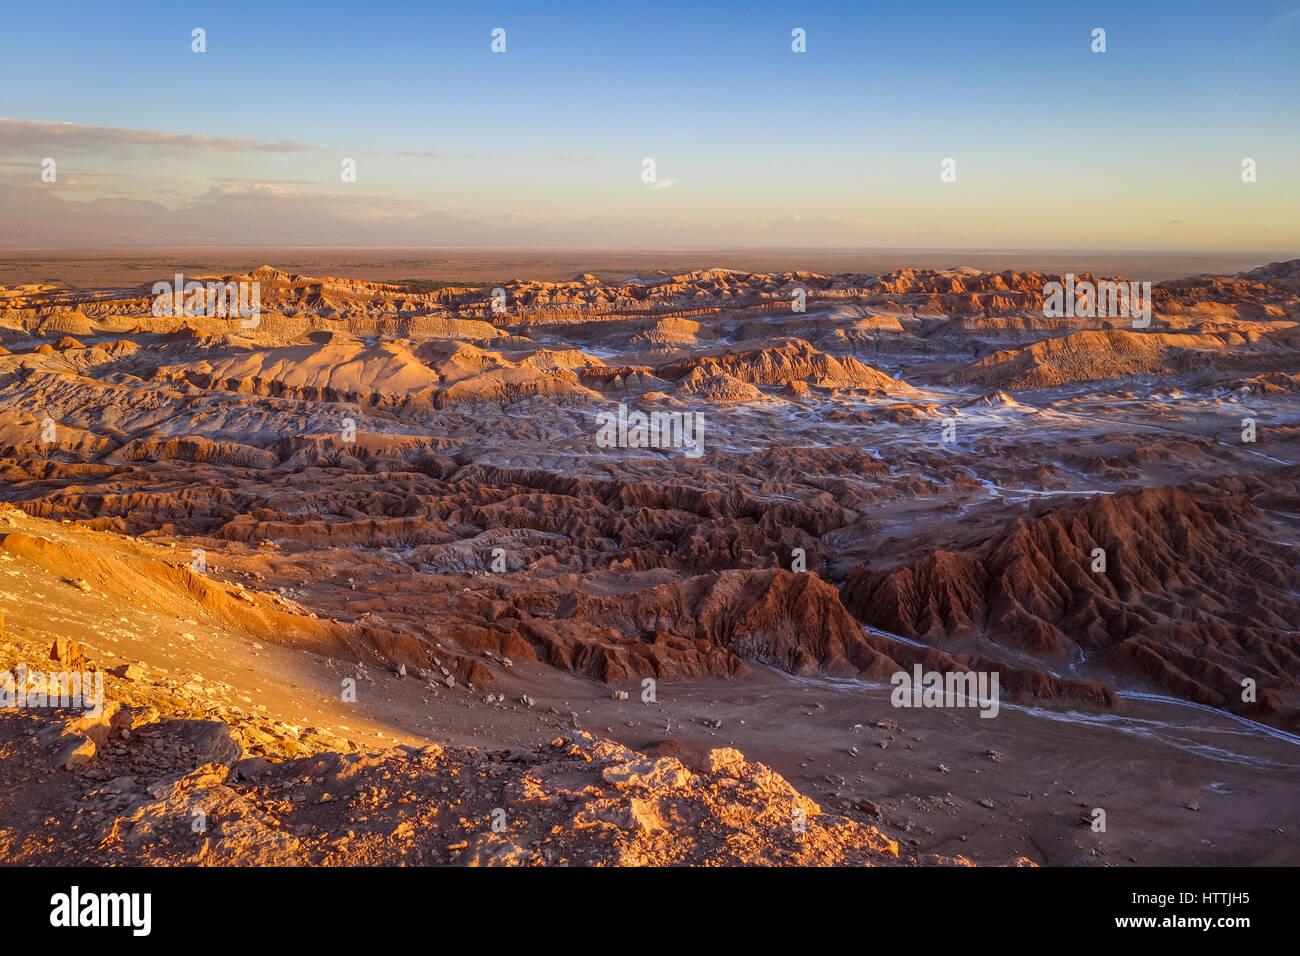 Valle de la Luna landscape at sunset in San Pedro de Atacama, Chile - Stock Image